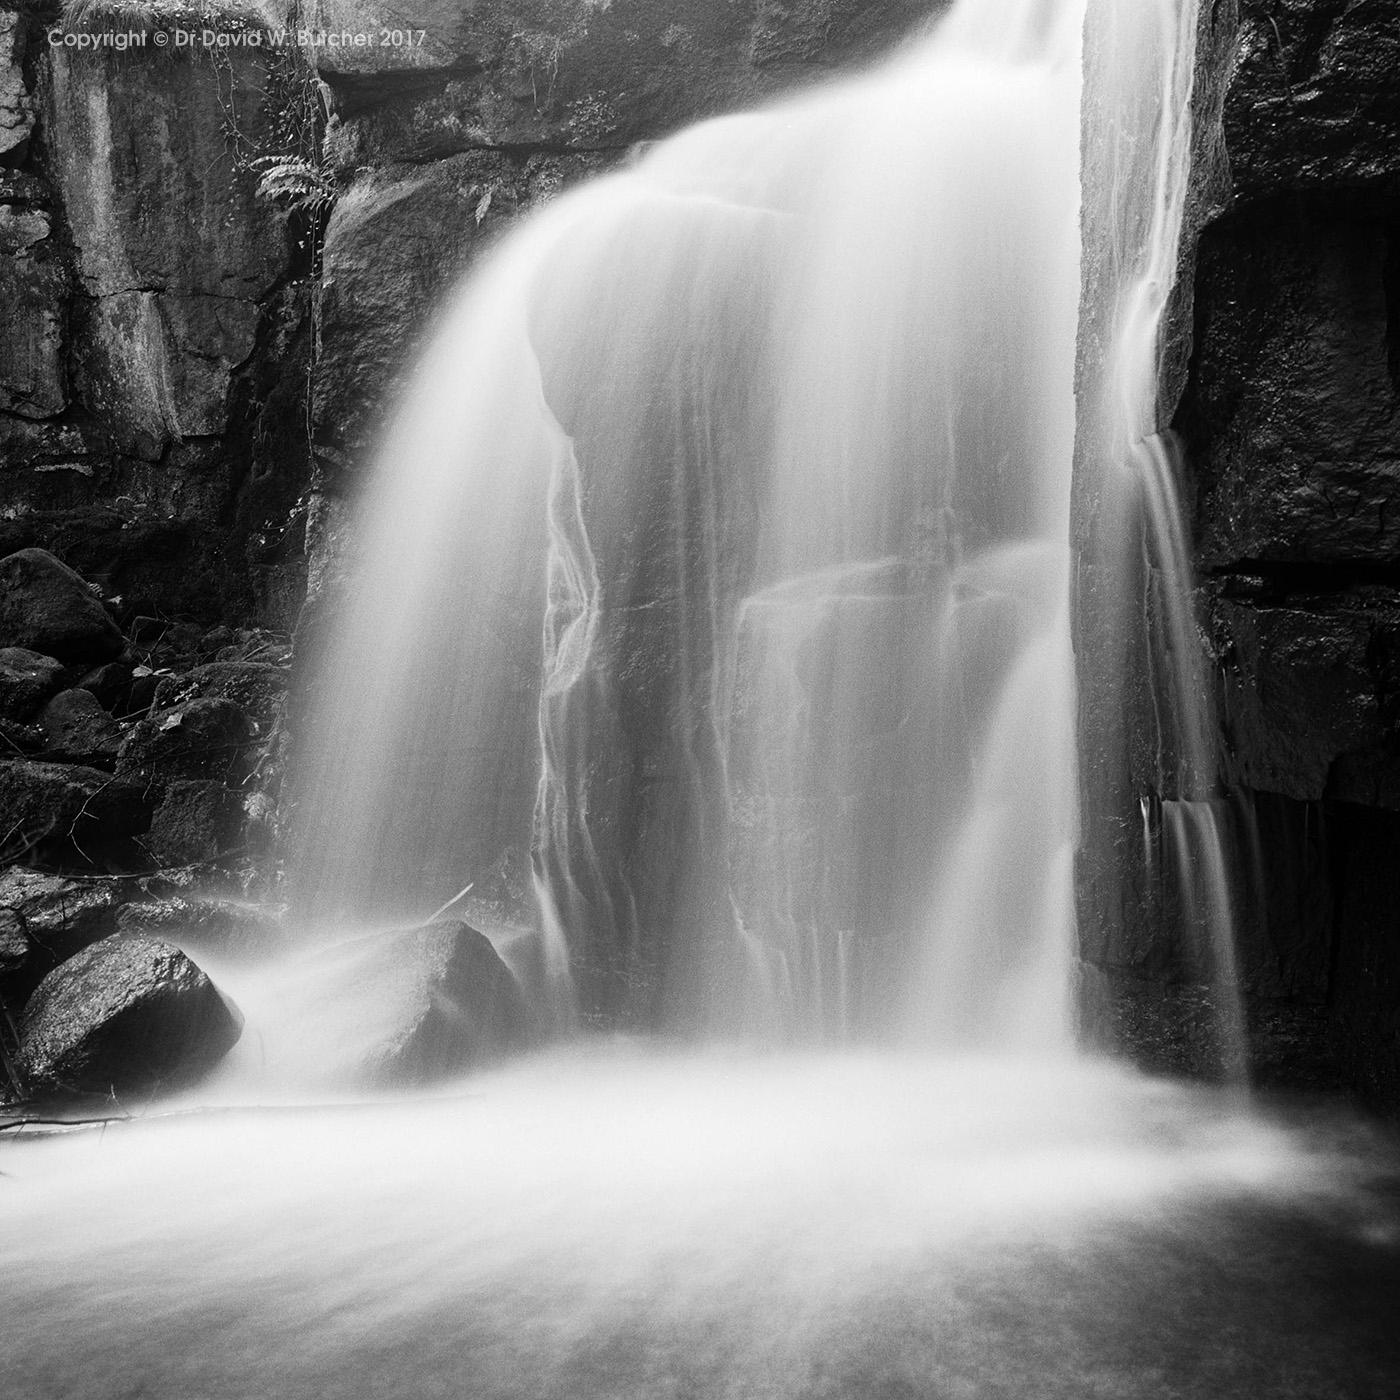 Lumsdale Falls, Matlock, Peak District